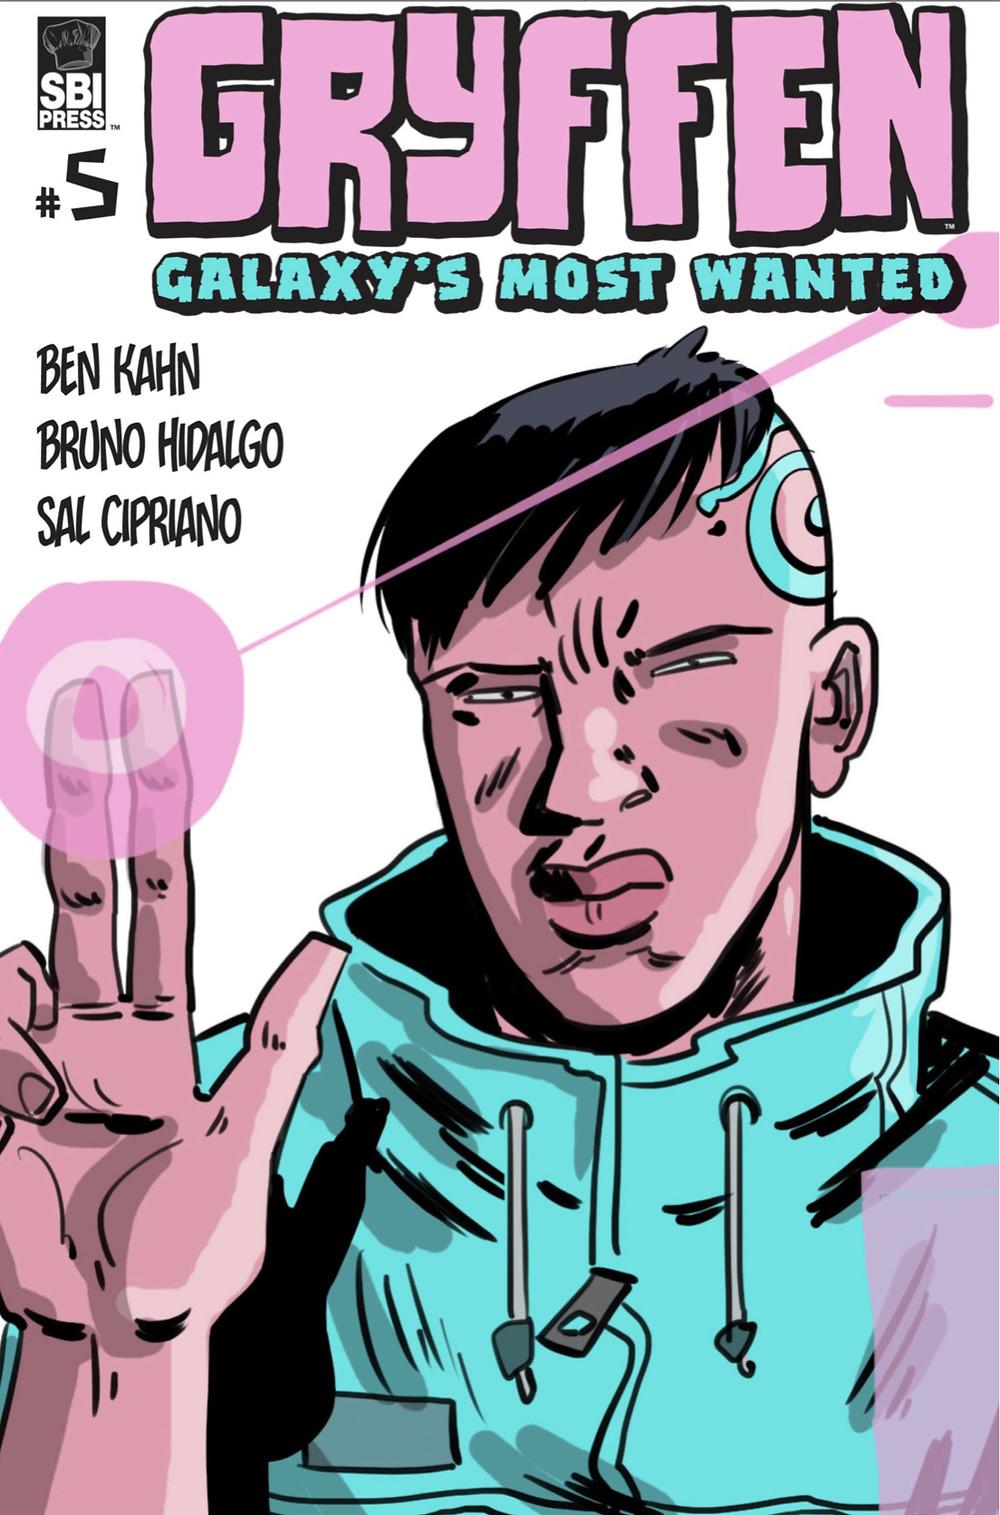 Gryffen, issue #5, cover, SBI Press, Kahn/Hidalgo